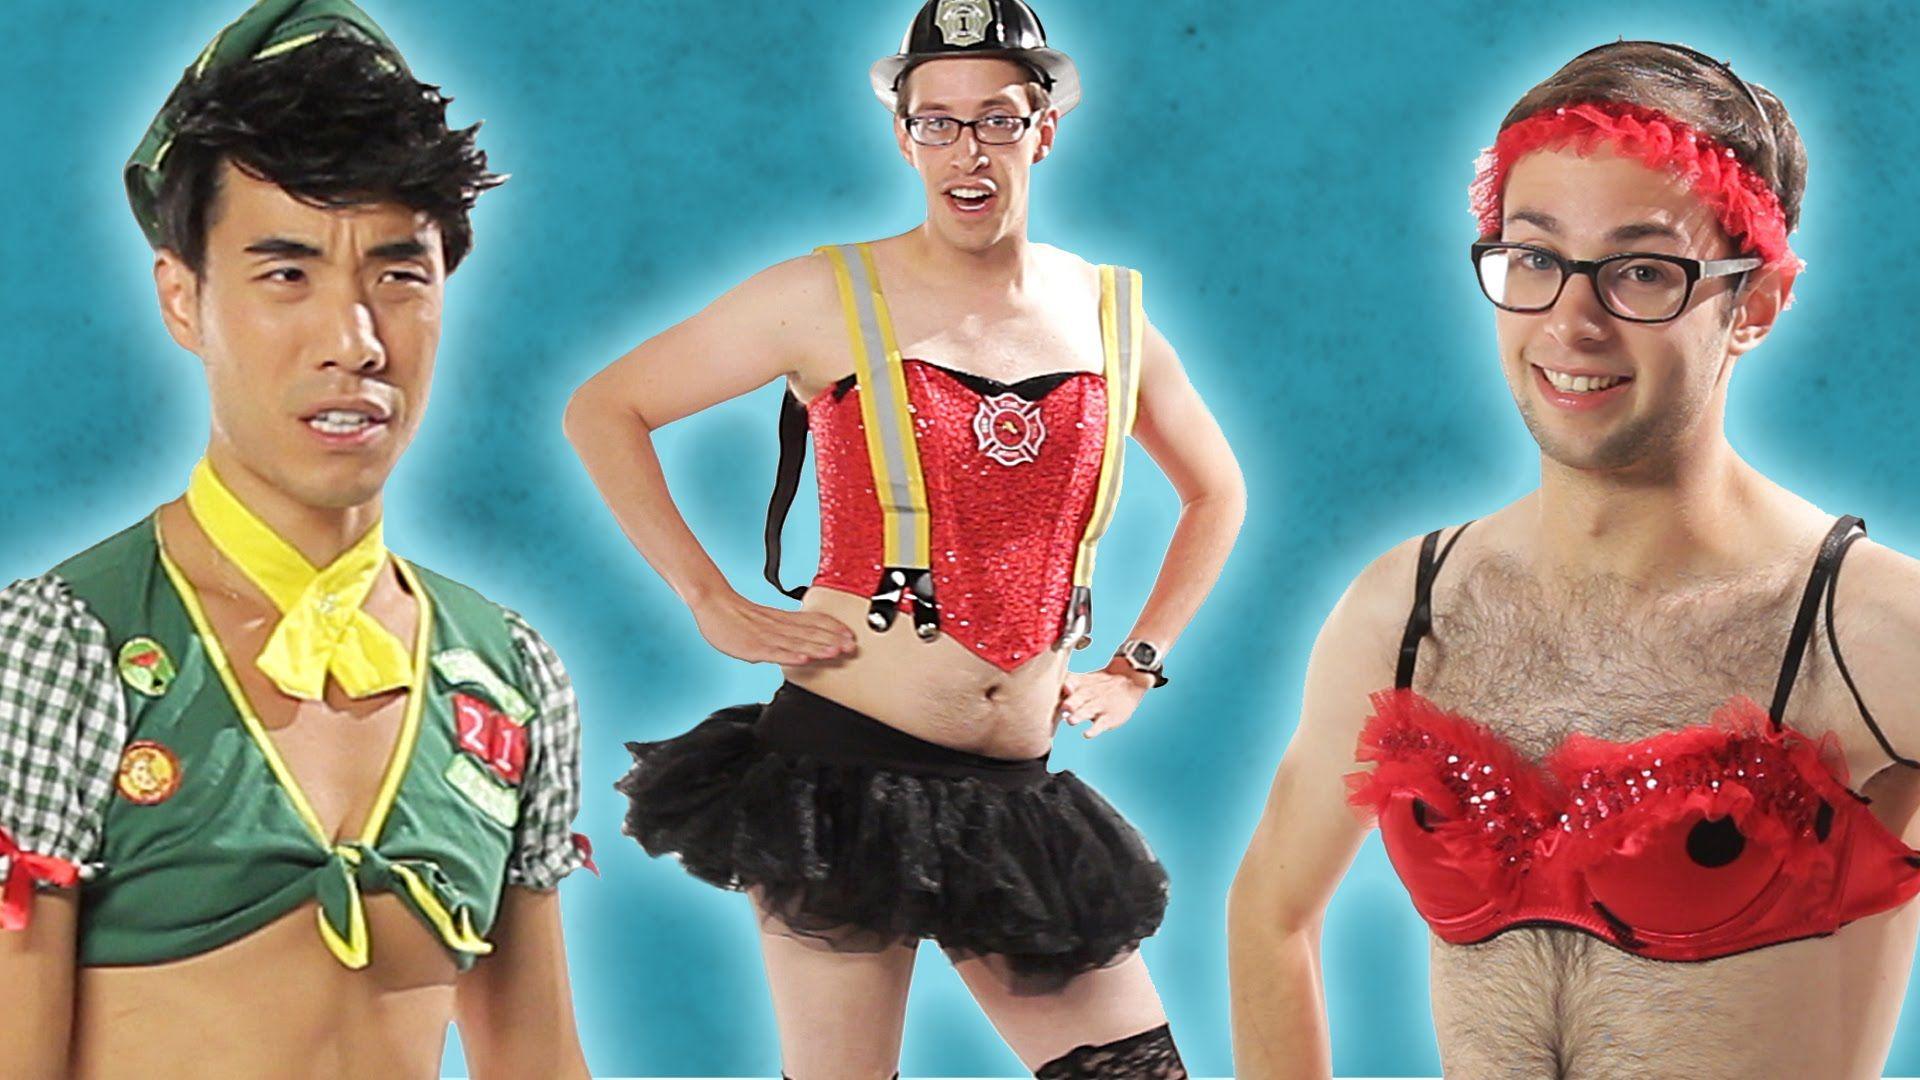 HOT: Men Try On Ladies' Sexy Halloween Costumes | Sexy halloween ...